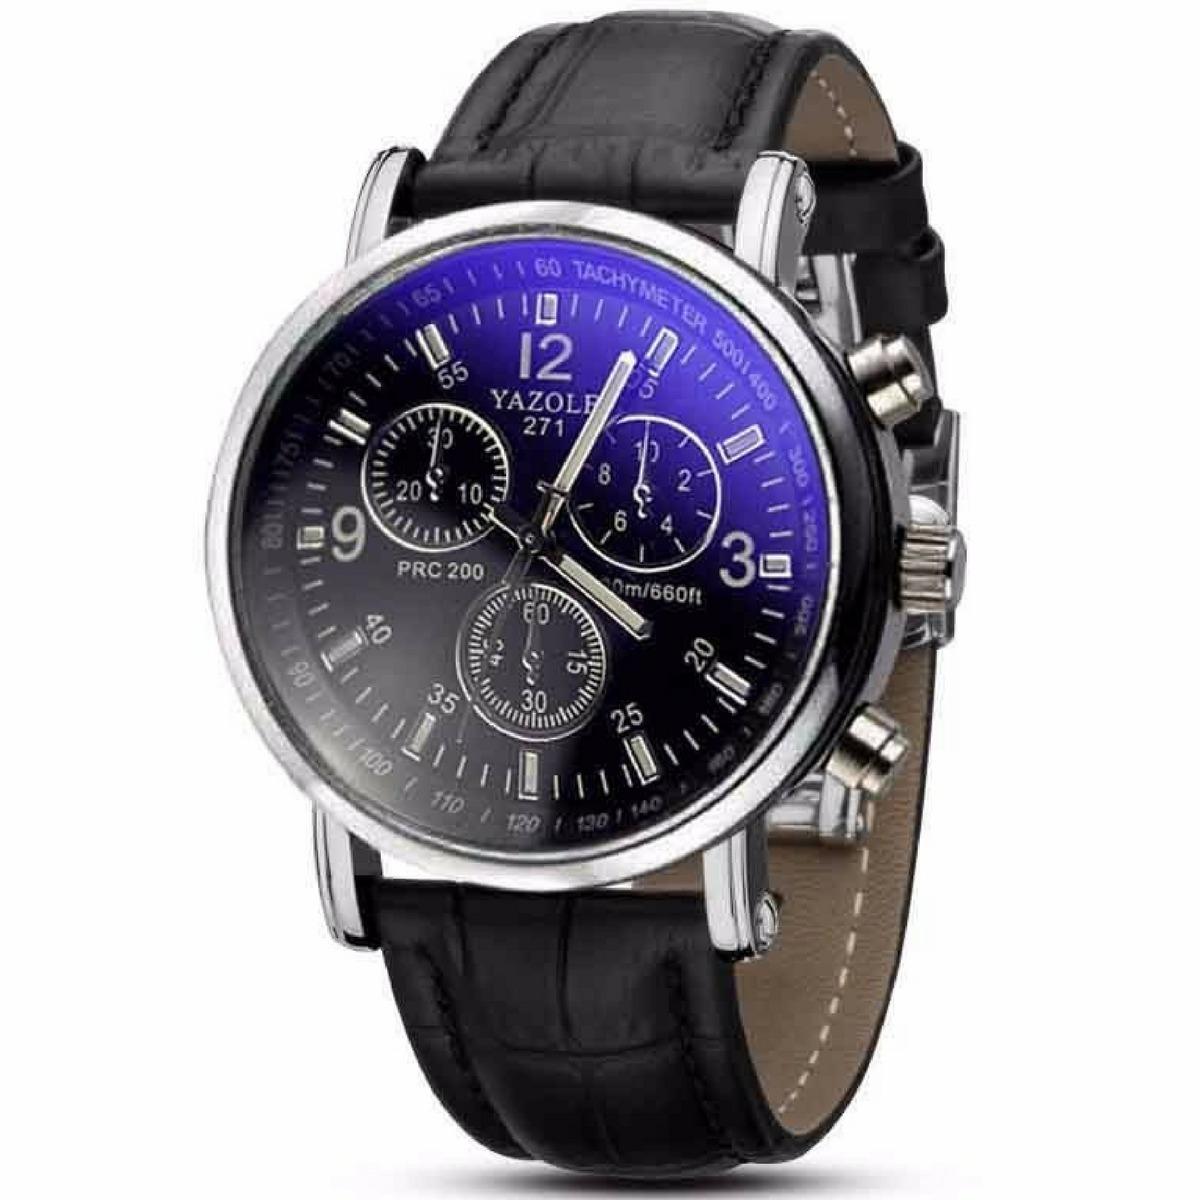 285c50807dc relógio masculino analógico de couro preto yazole 271. Carregando zoom.